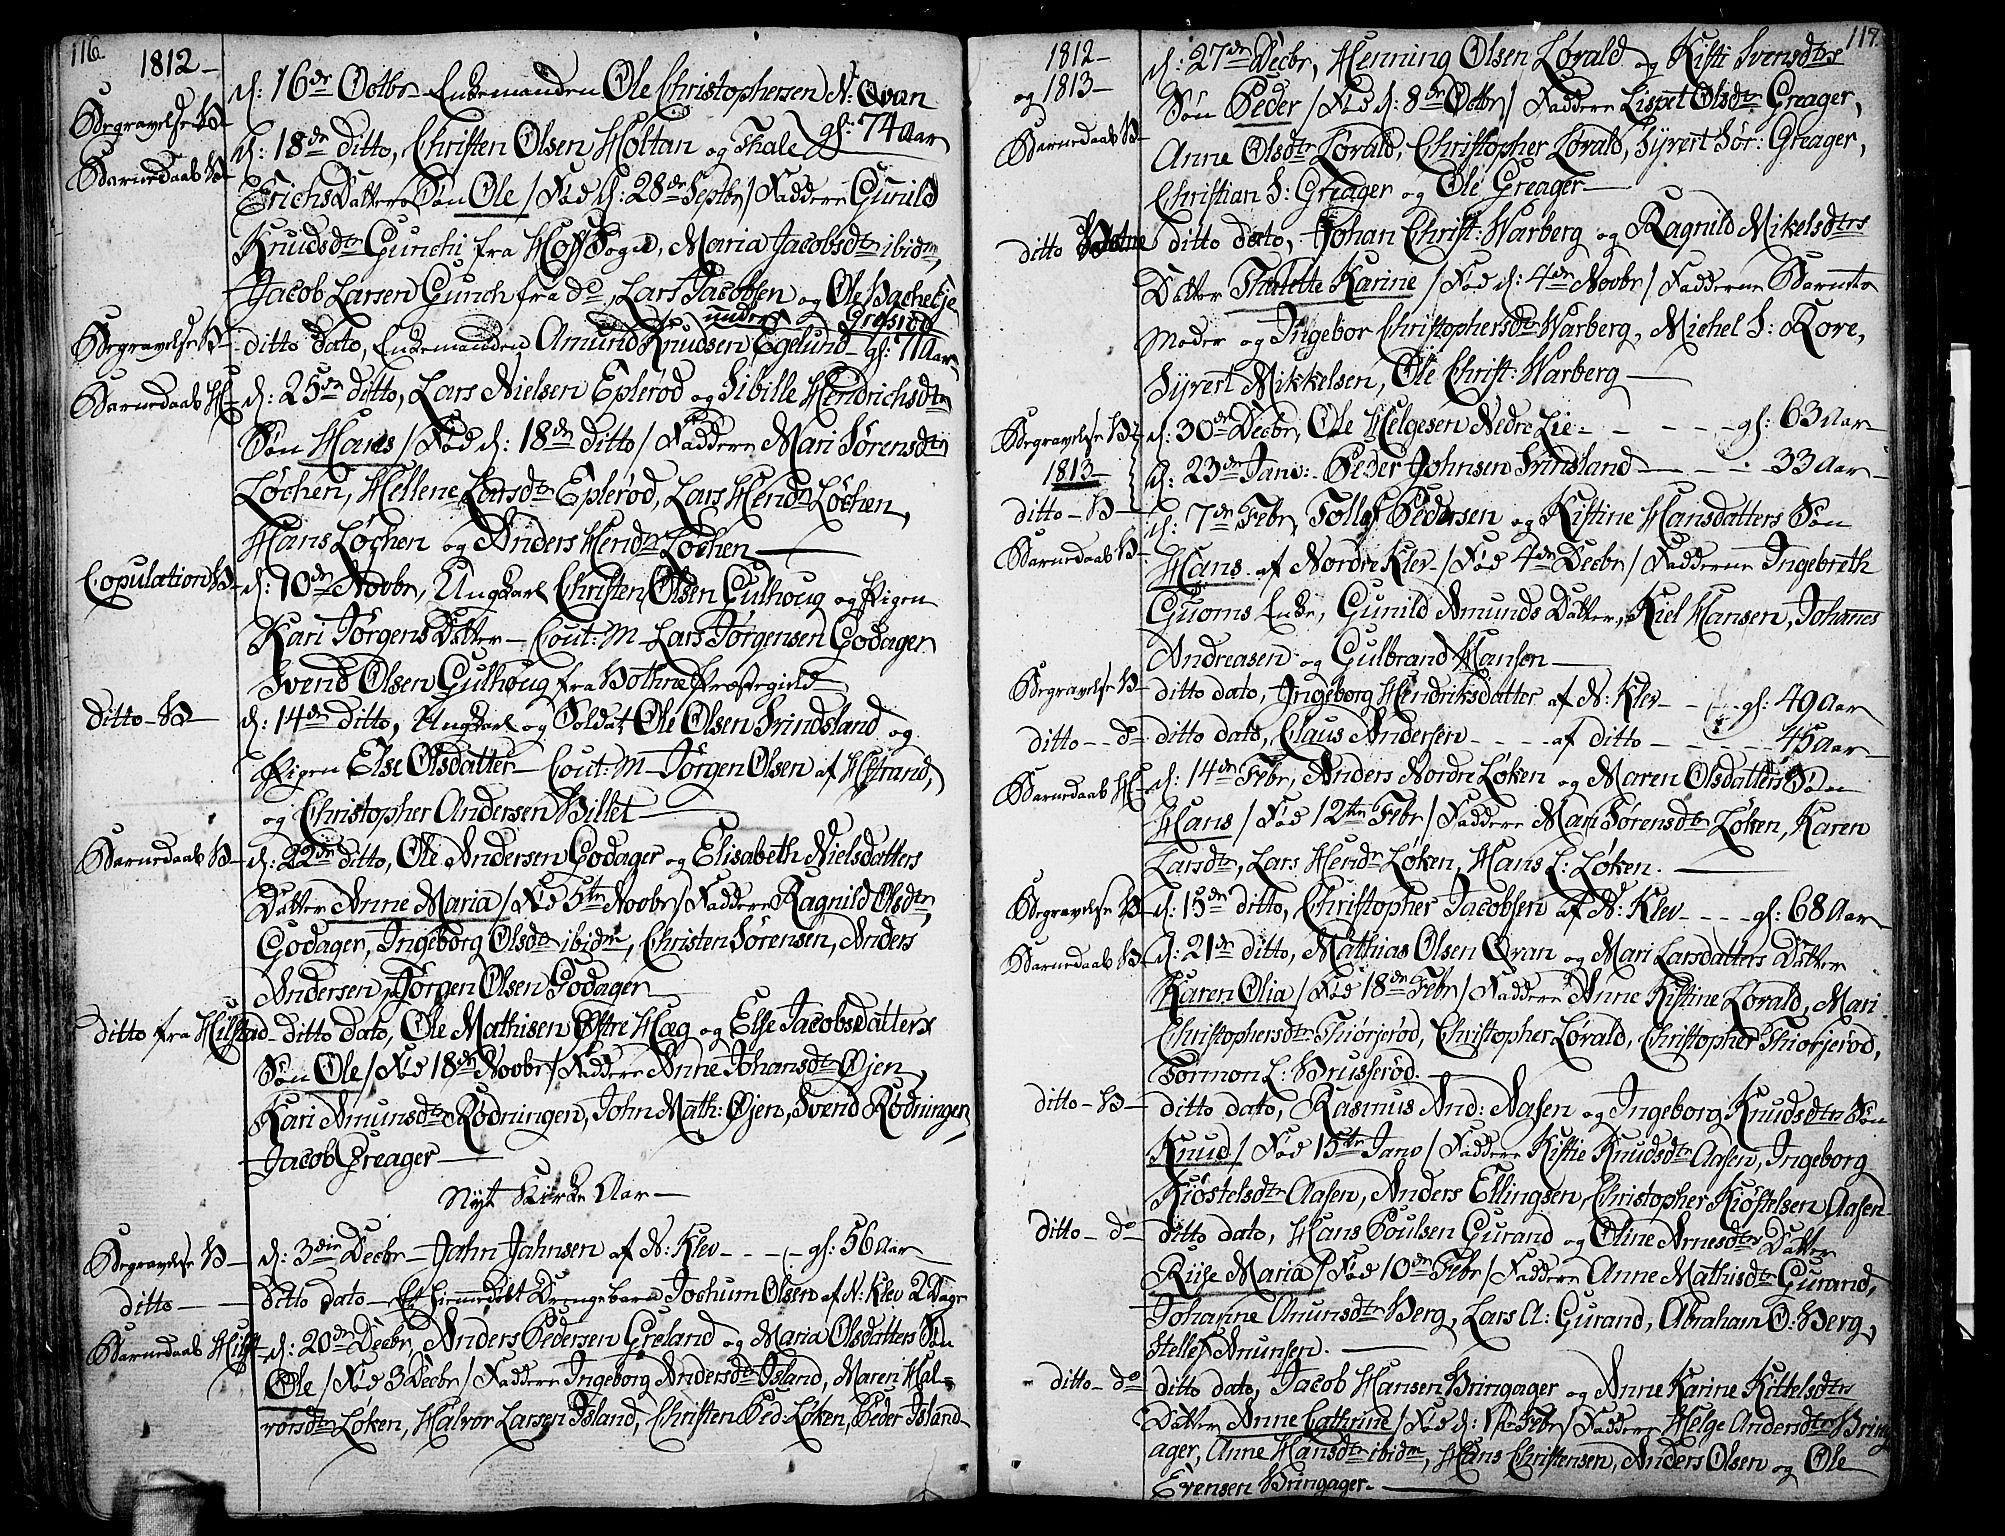 SAKO, Botne kirkebøker, F/Fa/L0003: Parish register (official) no. I 3 /1, 1792-1844, p. 116-117